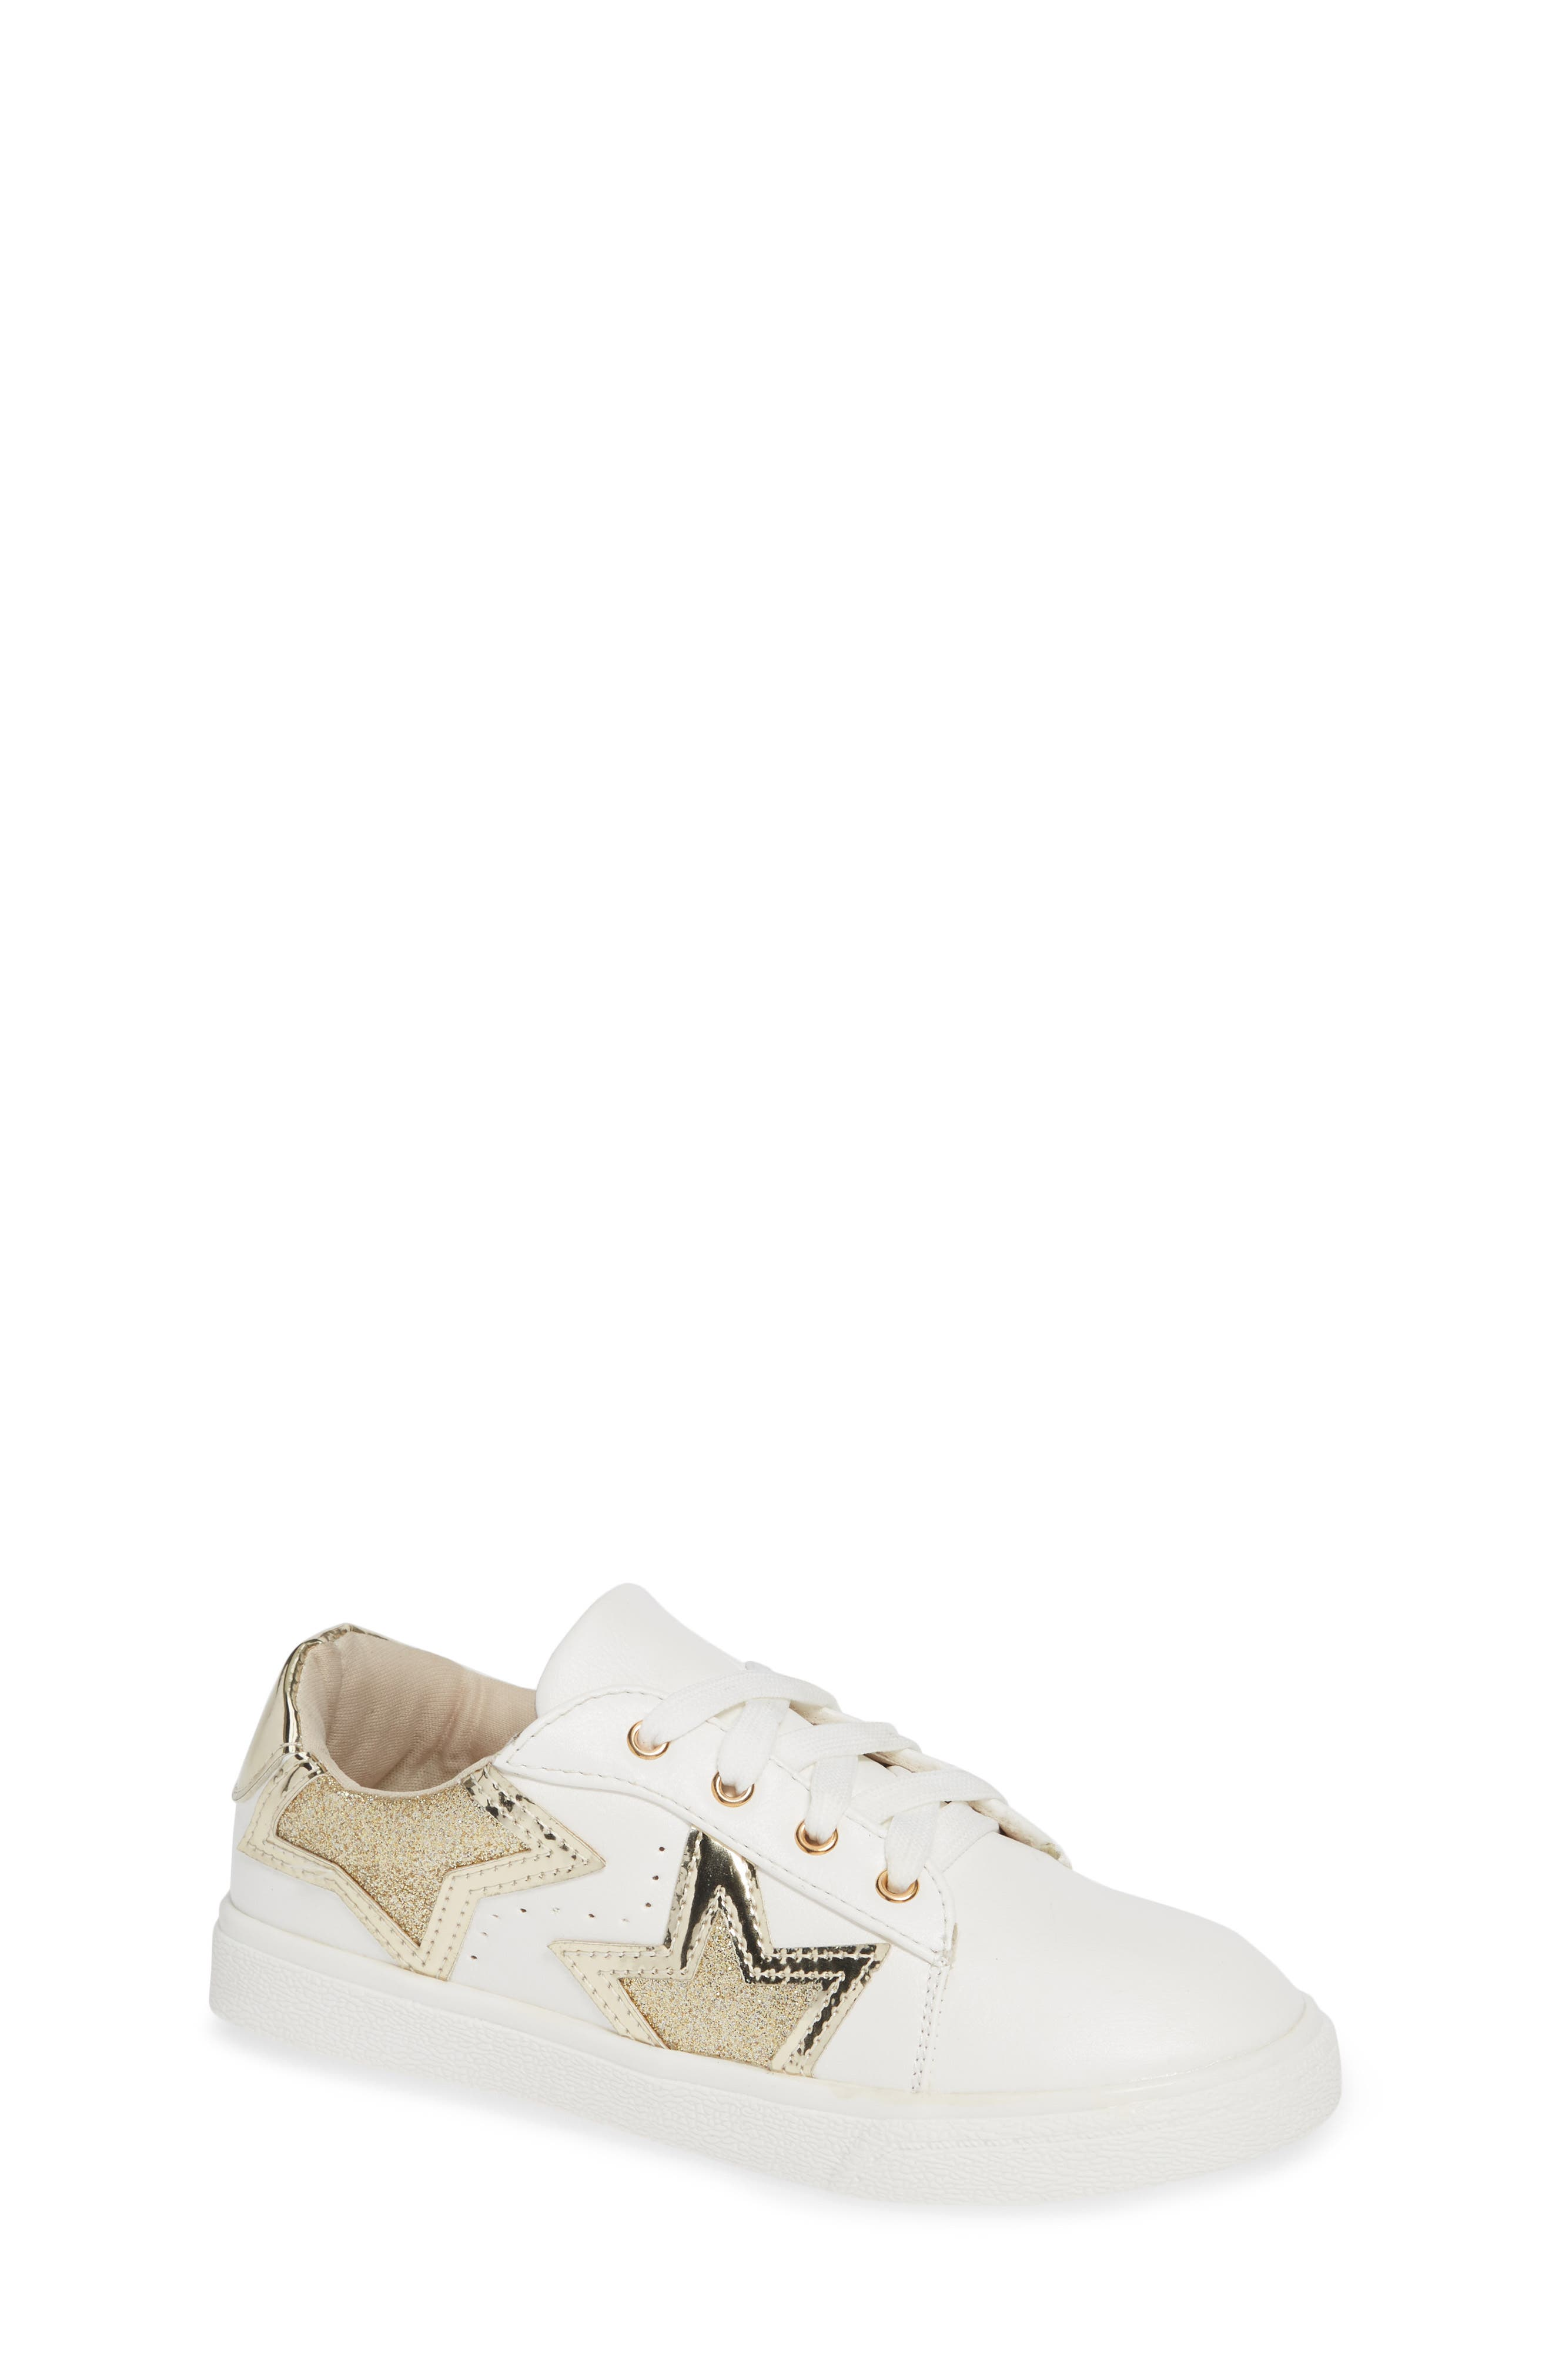 Miss Harper Appliqué Glitter Sneaker,                         Main,                         color, WHITE W/ GOLD STAR